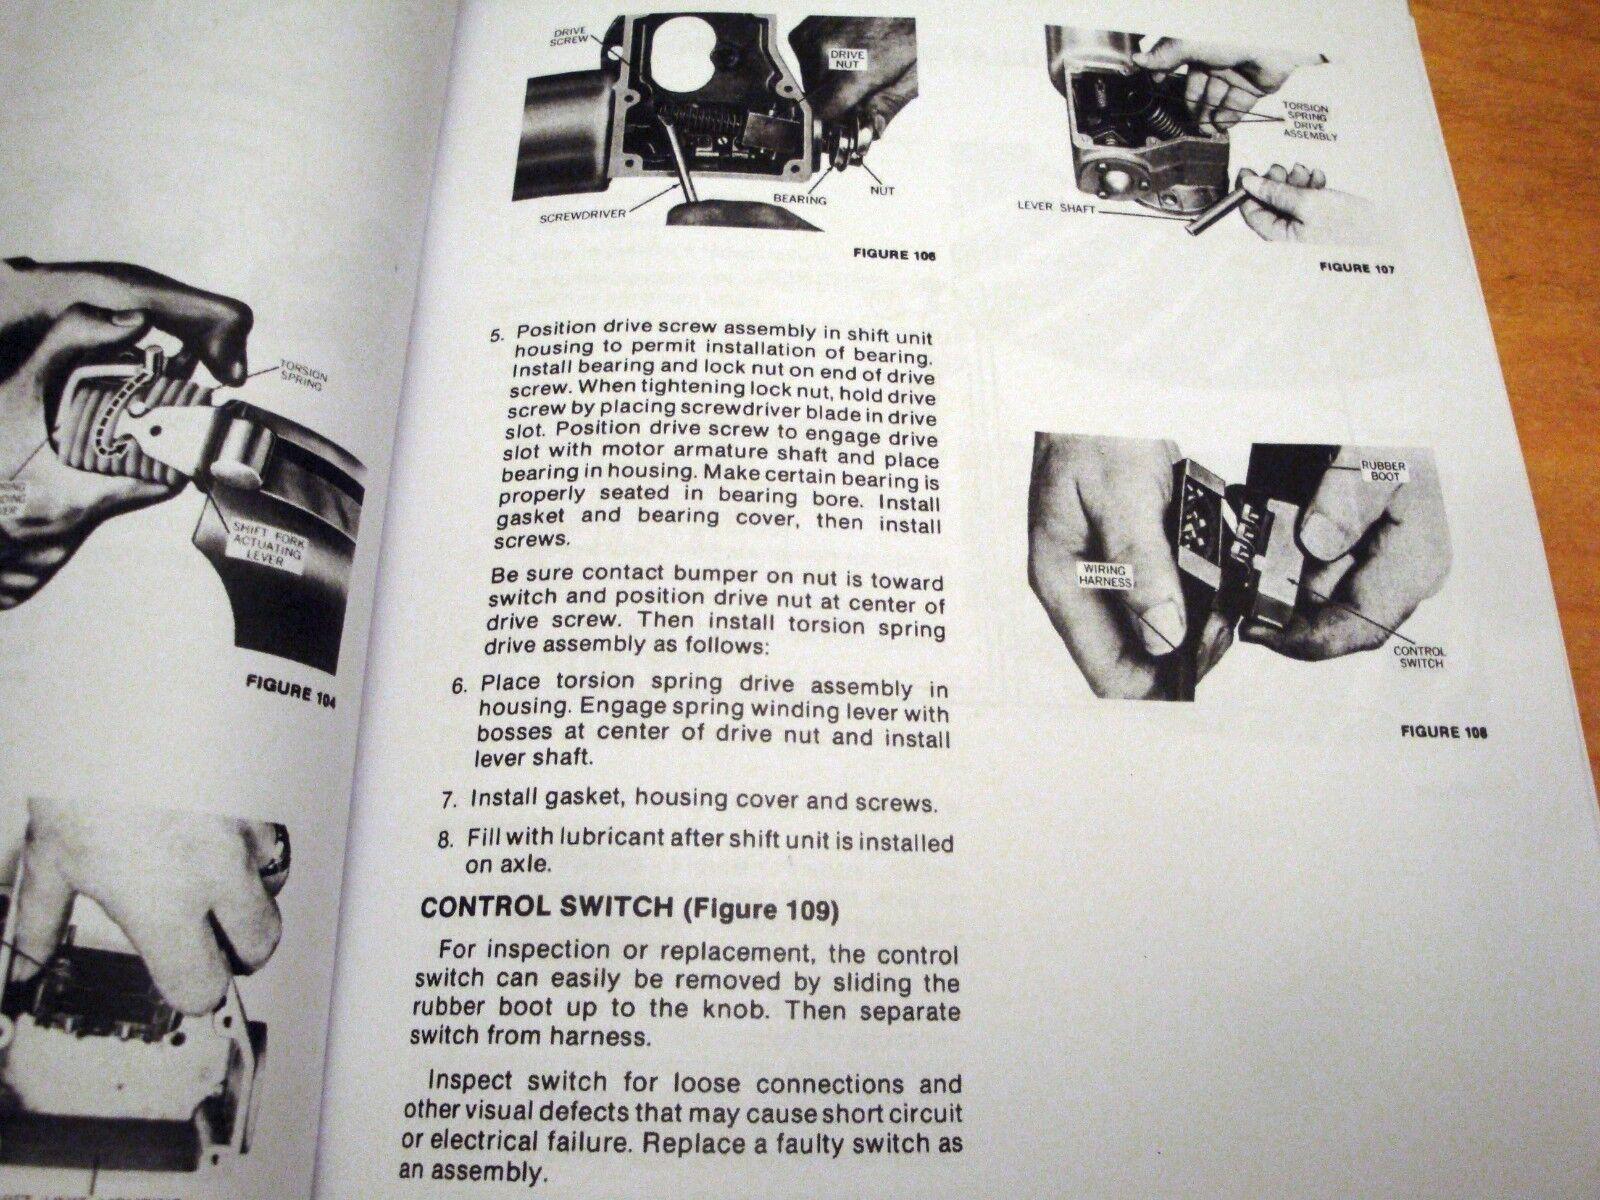 OEM Holland 1068 1069 1075 Stackcruiser Bale Wagon Service Repair Manual |  eBay